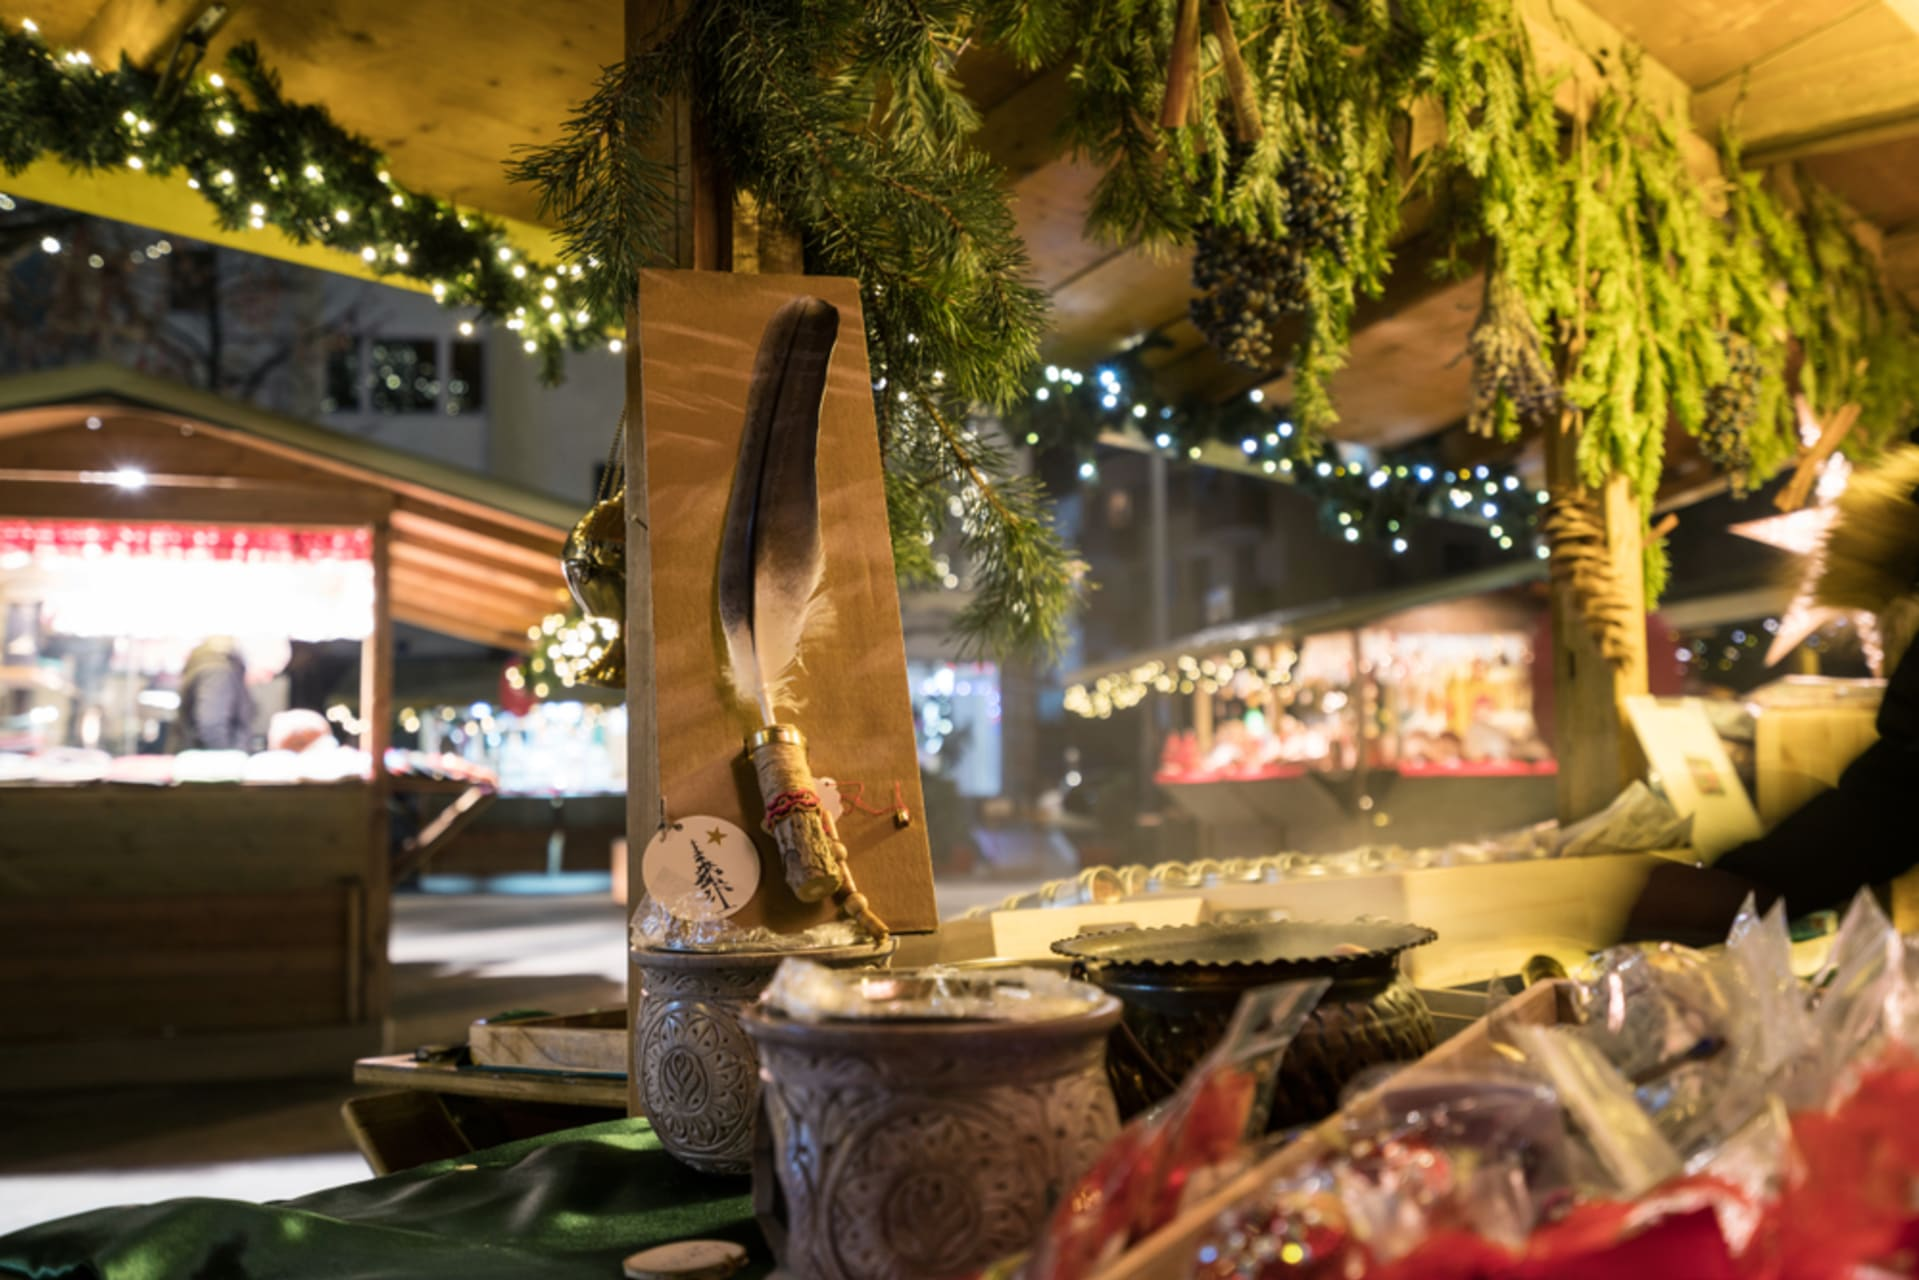 Haarlem - Christmas Markets & Sinterklaas in Haarlem